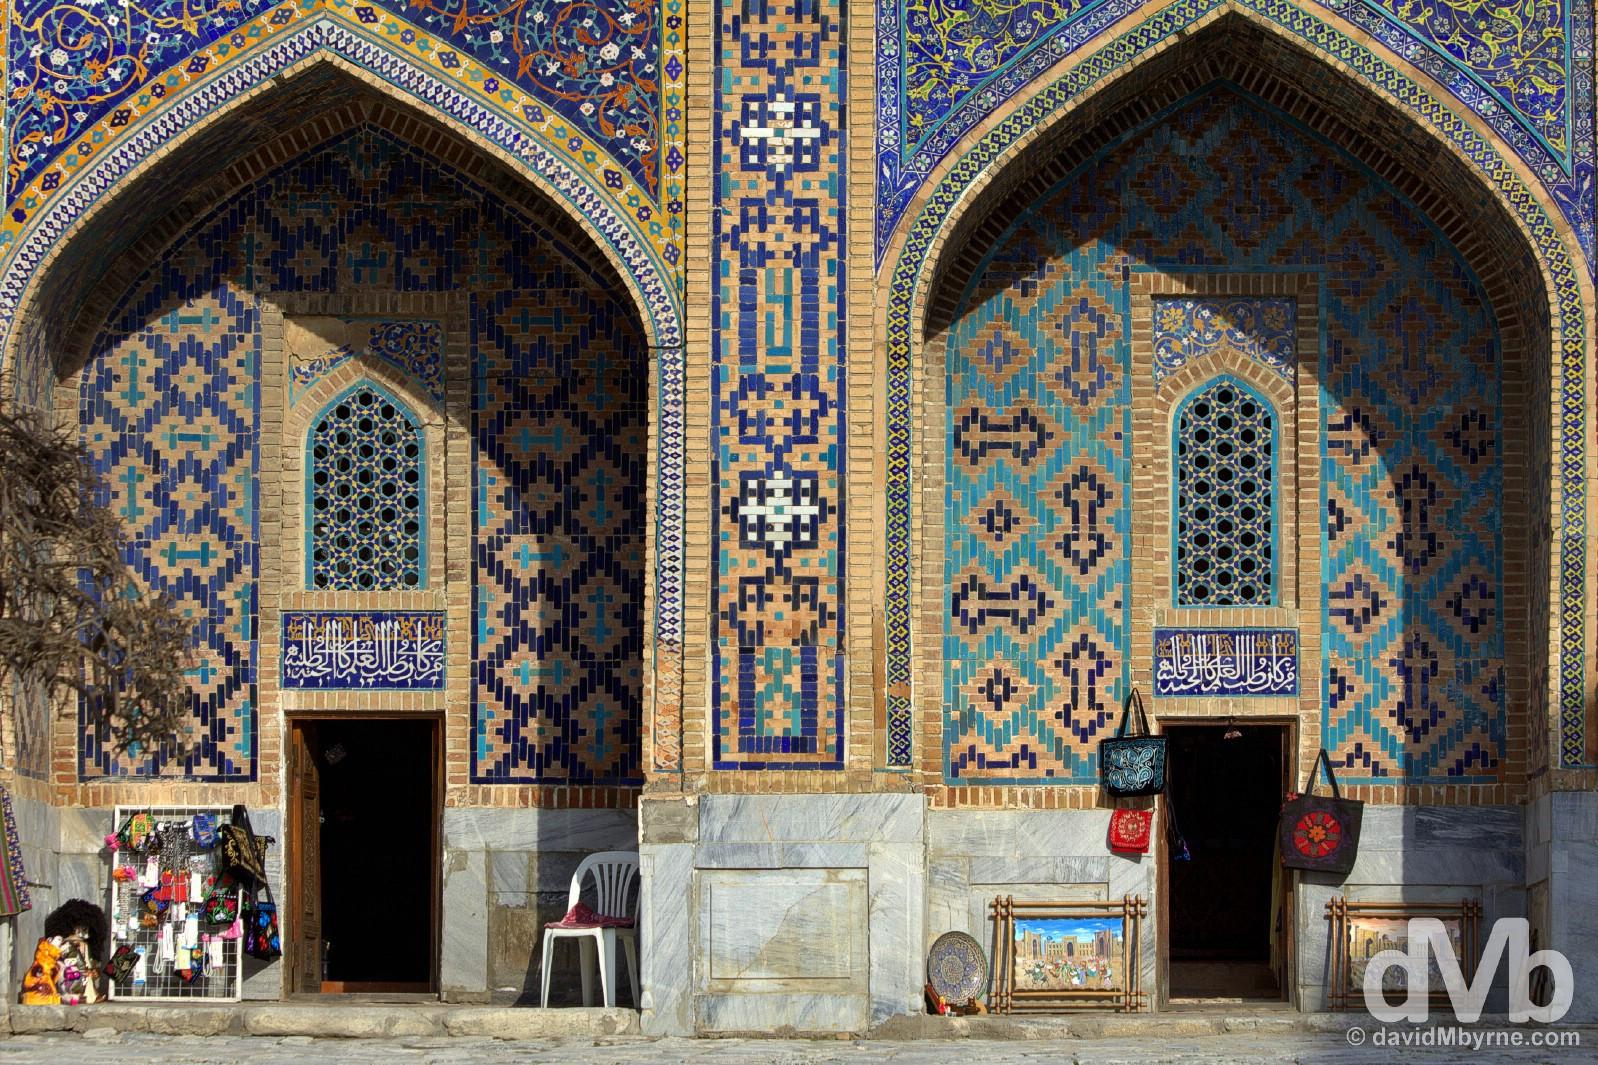 Souvenirs for sale in the courtyard of the Tilla-Kari Medressa of the Registan in Samarkand, Uzbekistan. March 8, 2015.